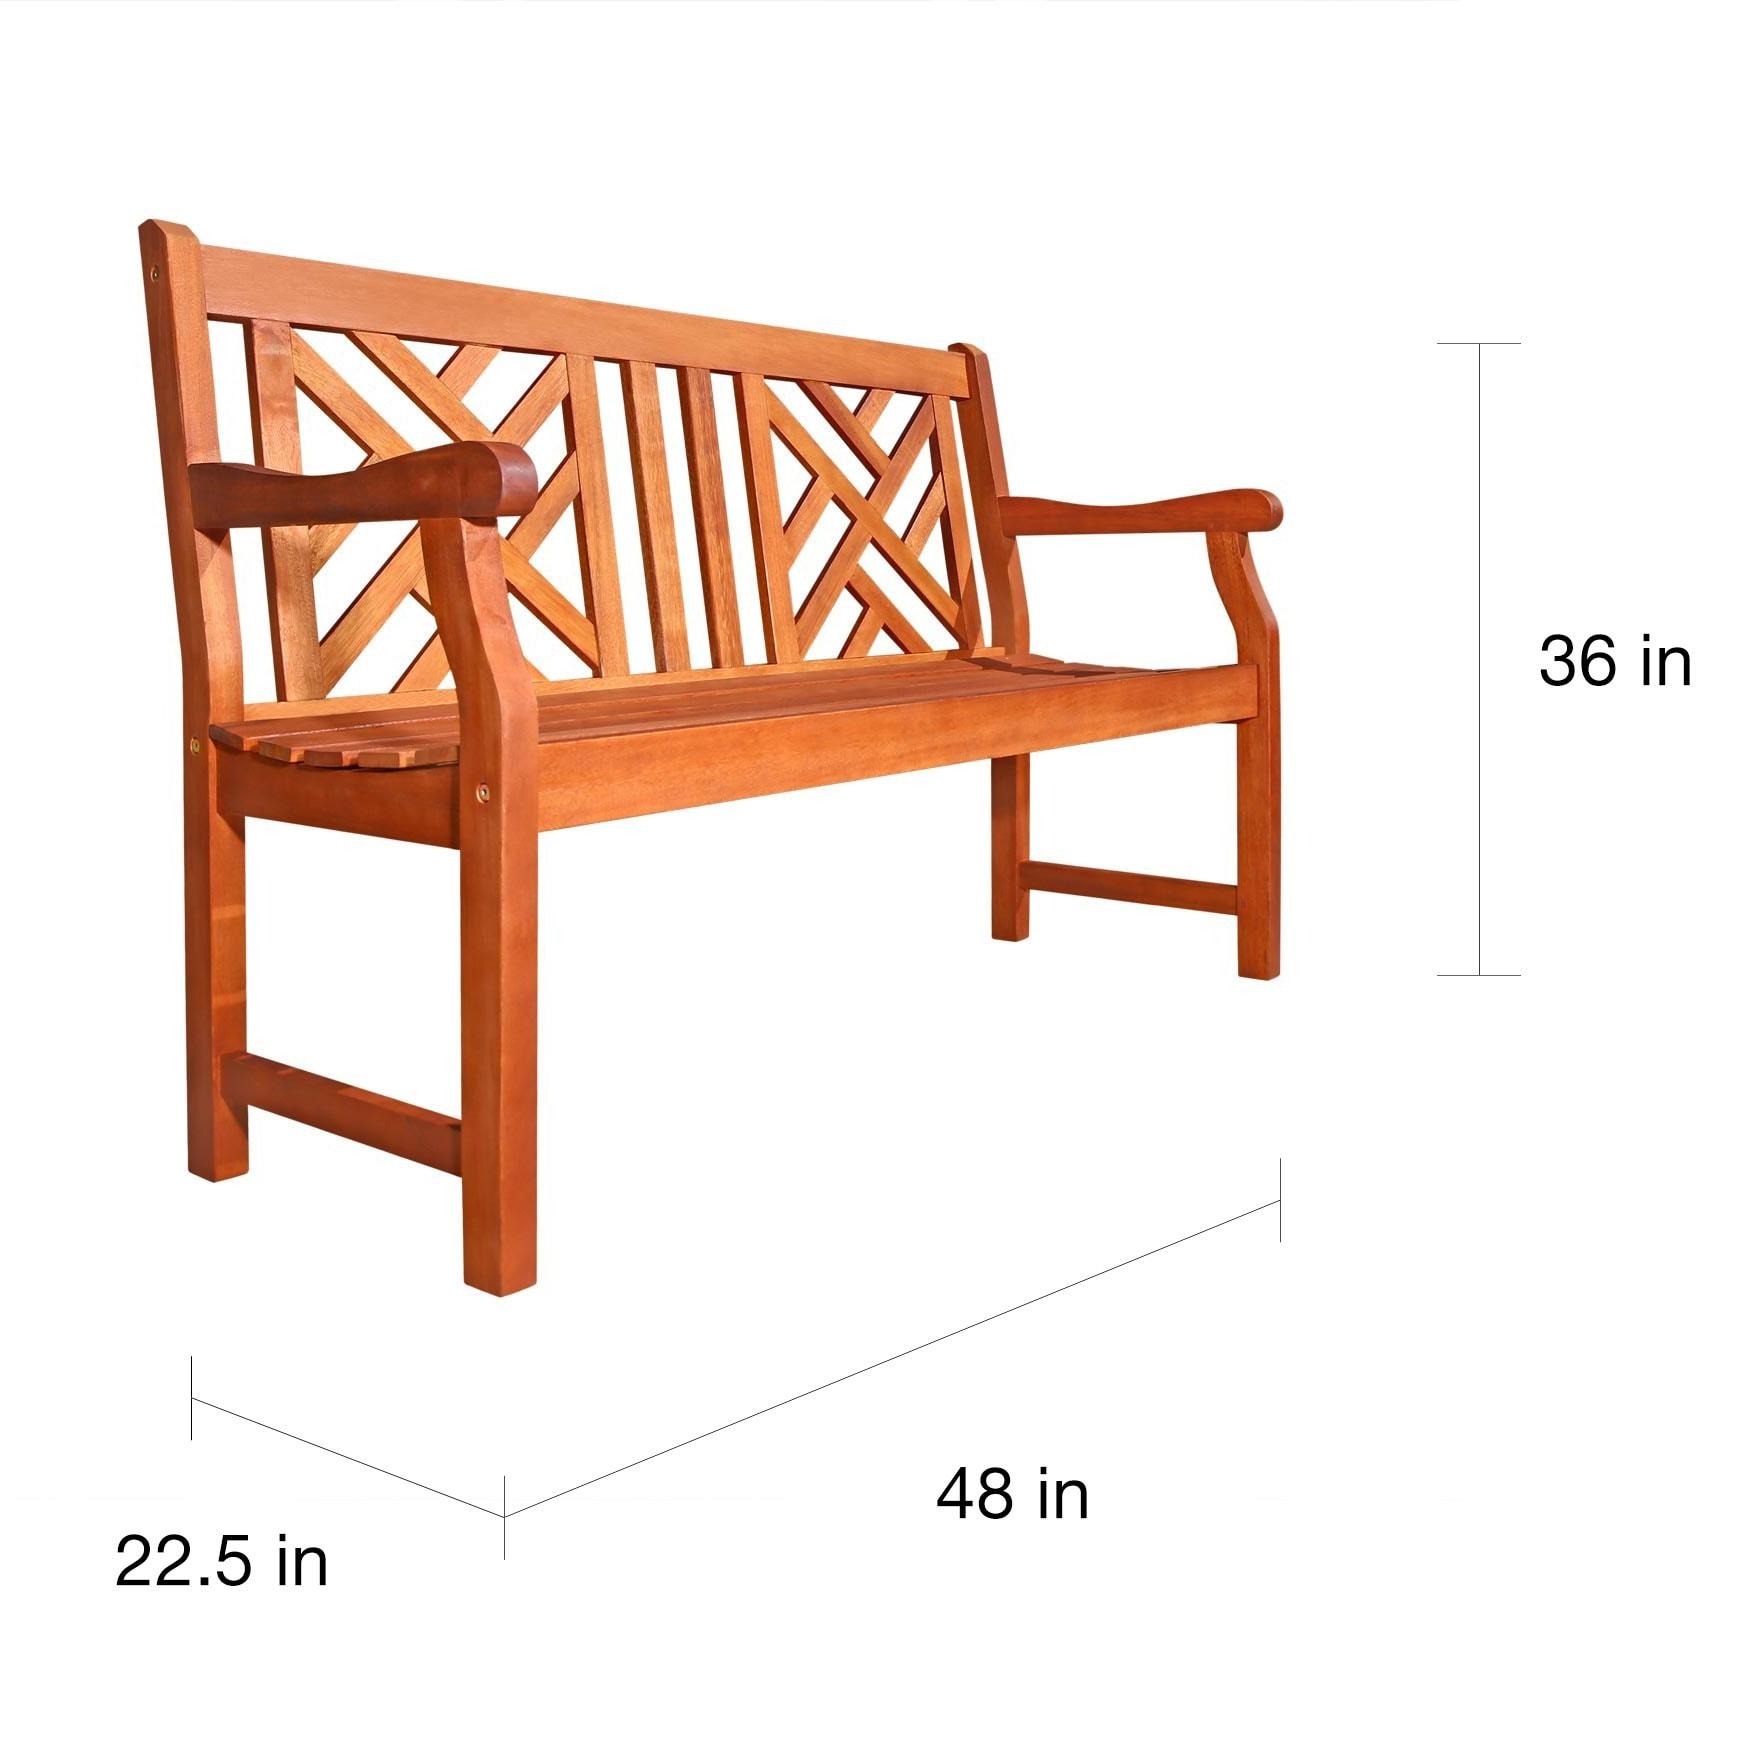 Shop Atlantic 4 Foot Eucalyptus Wood Outdoor Bench   Free Shipping Today    Overstock.com   22727543